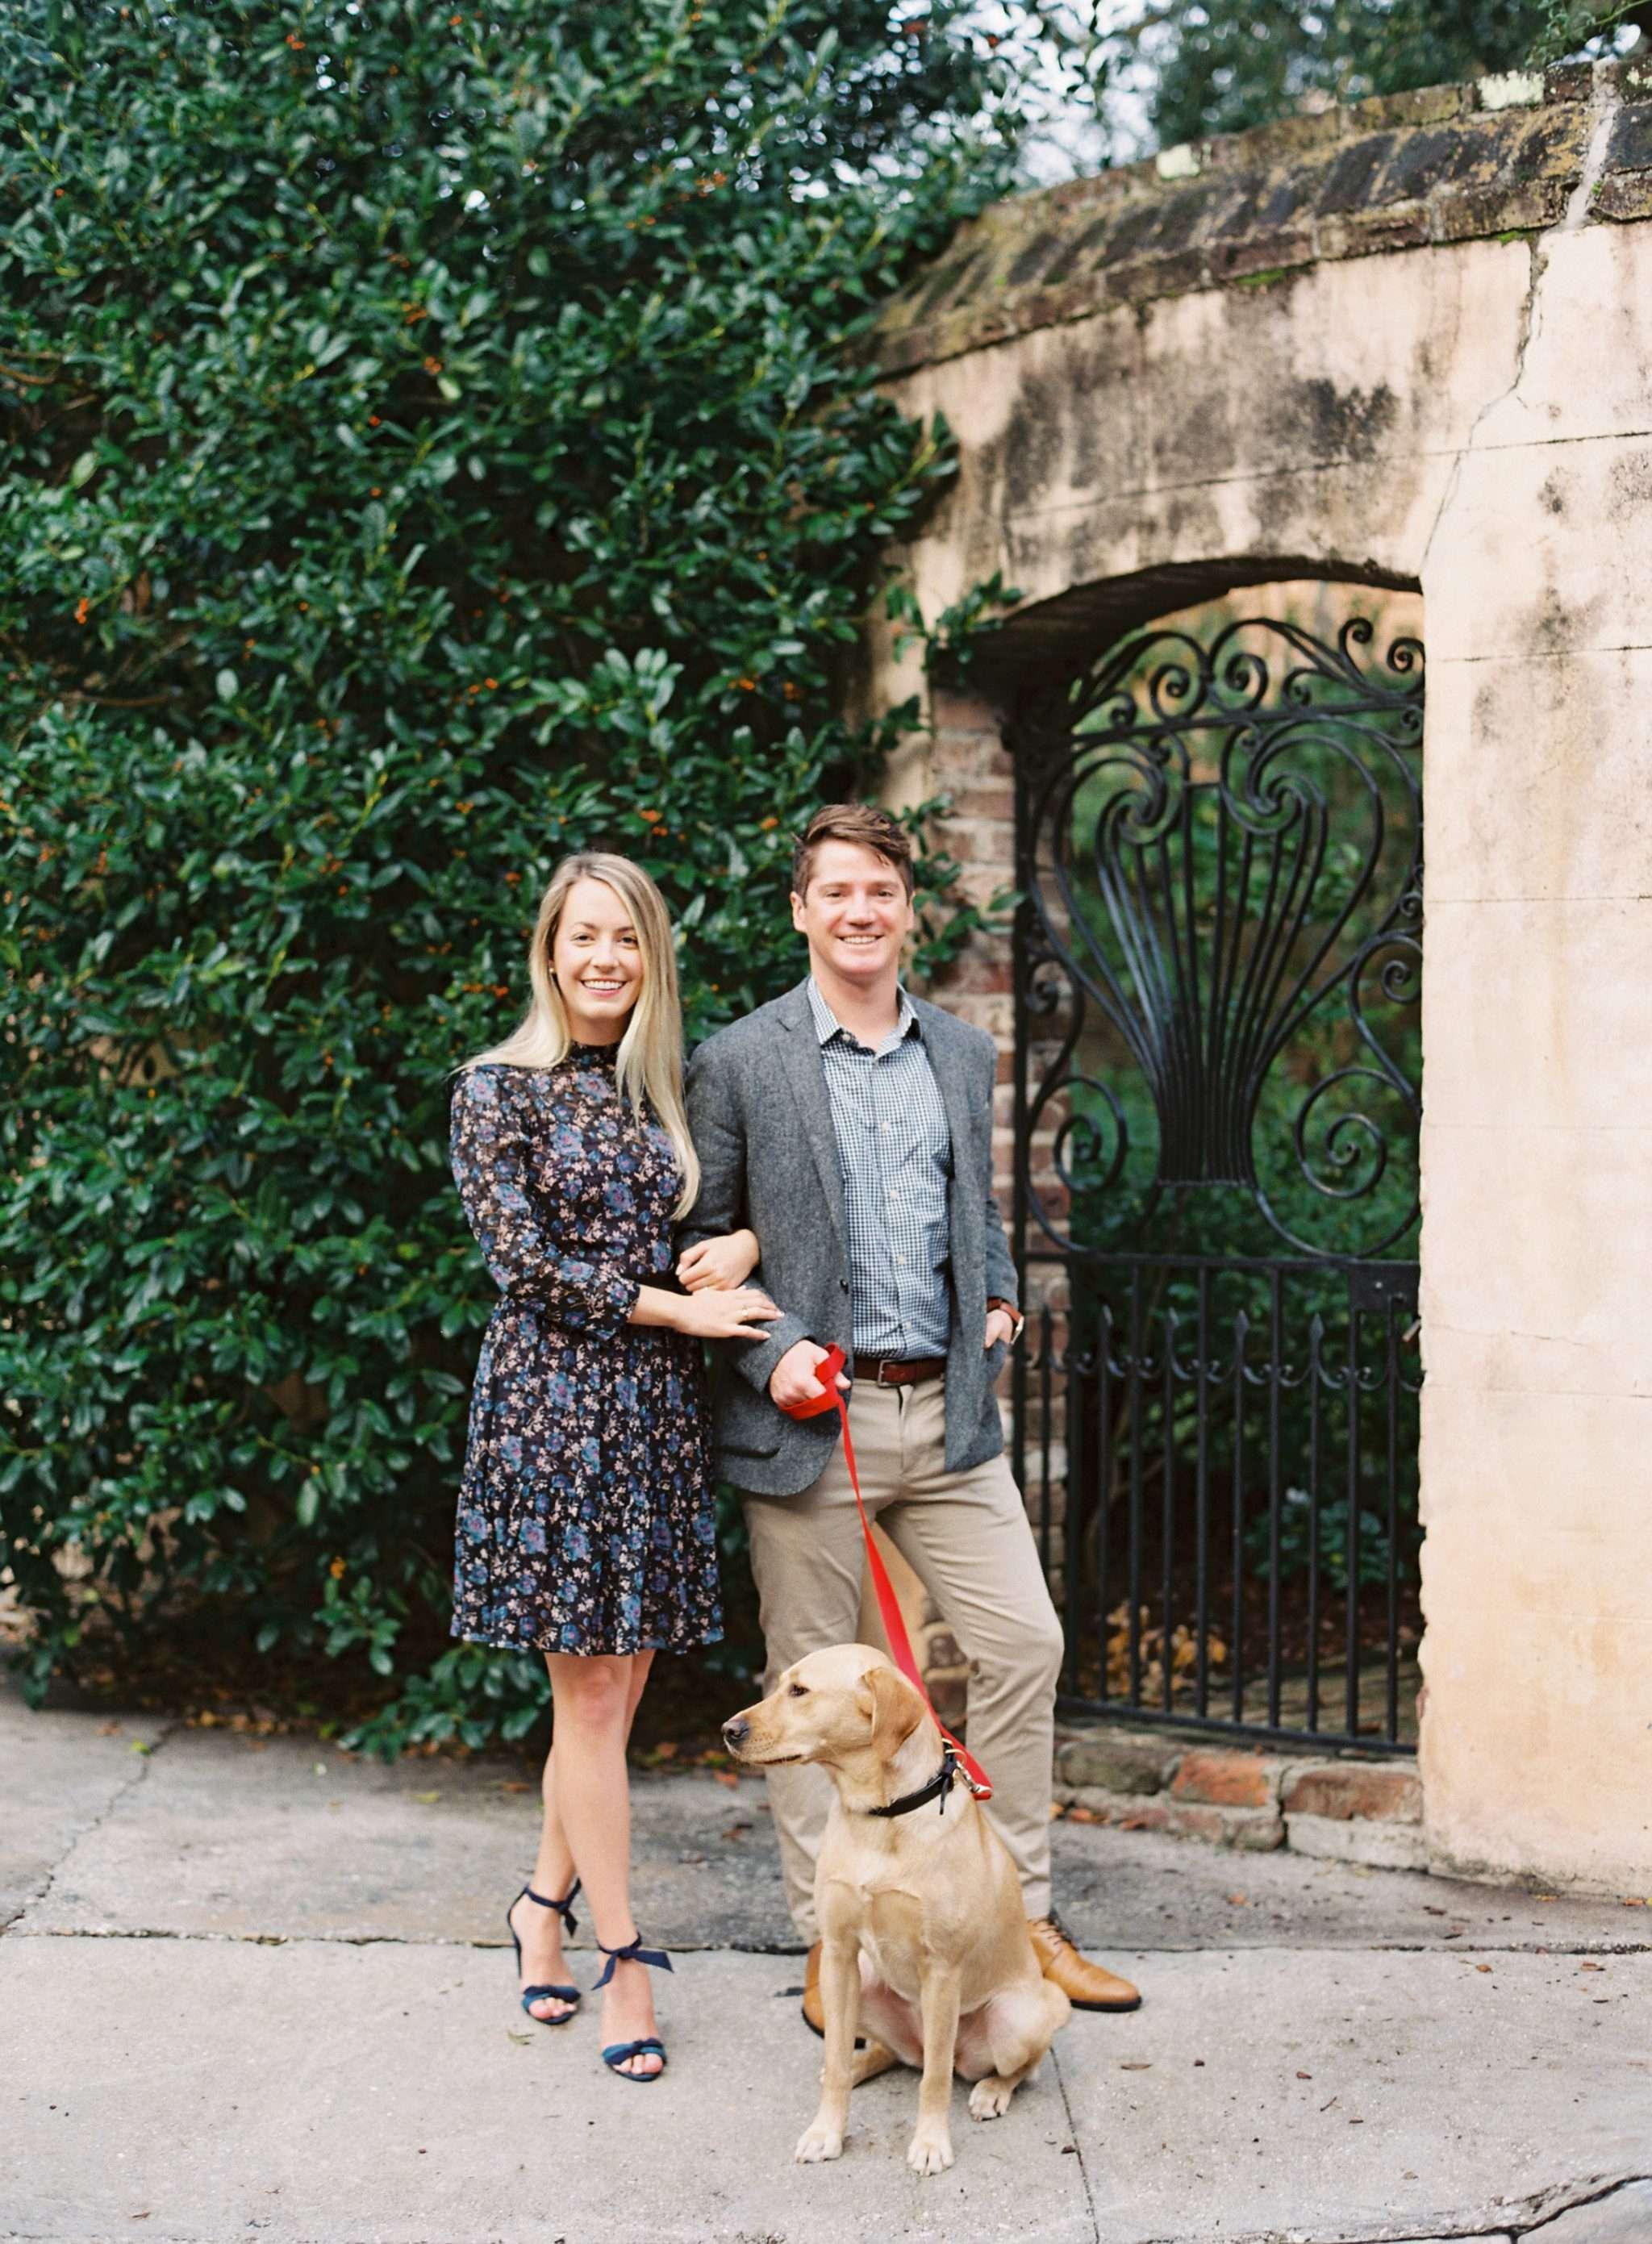 Merry Christmas from Charleston! | Rhyme & Reason